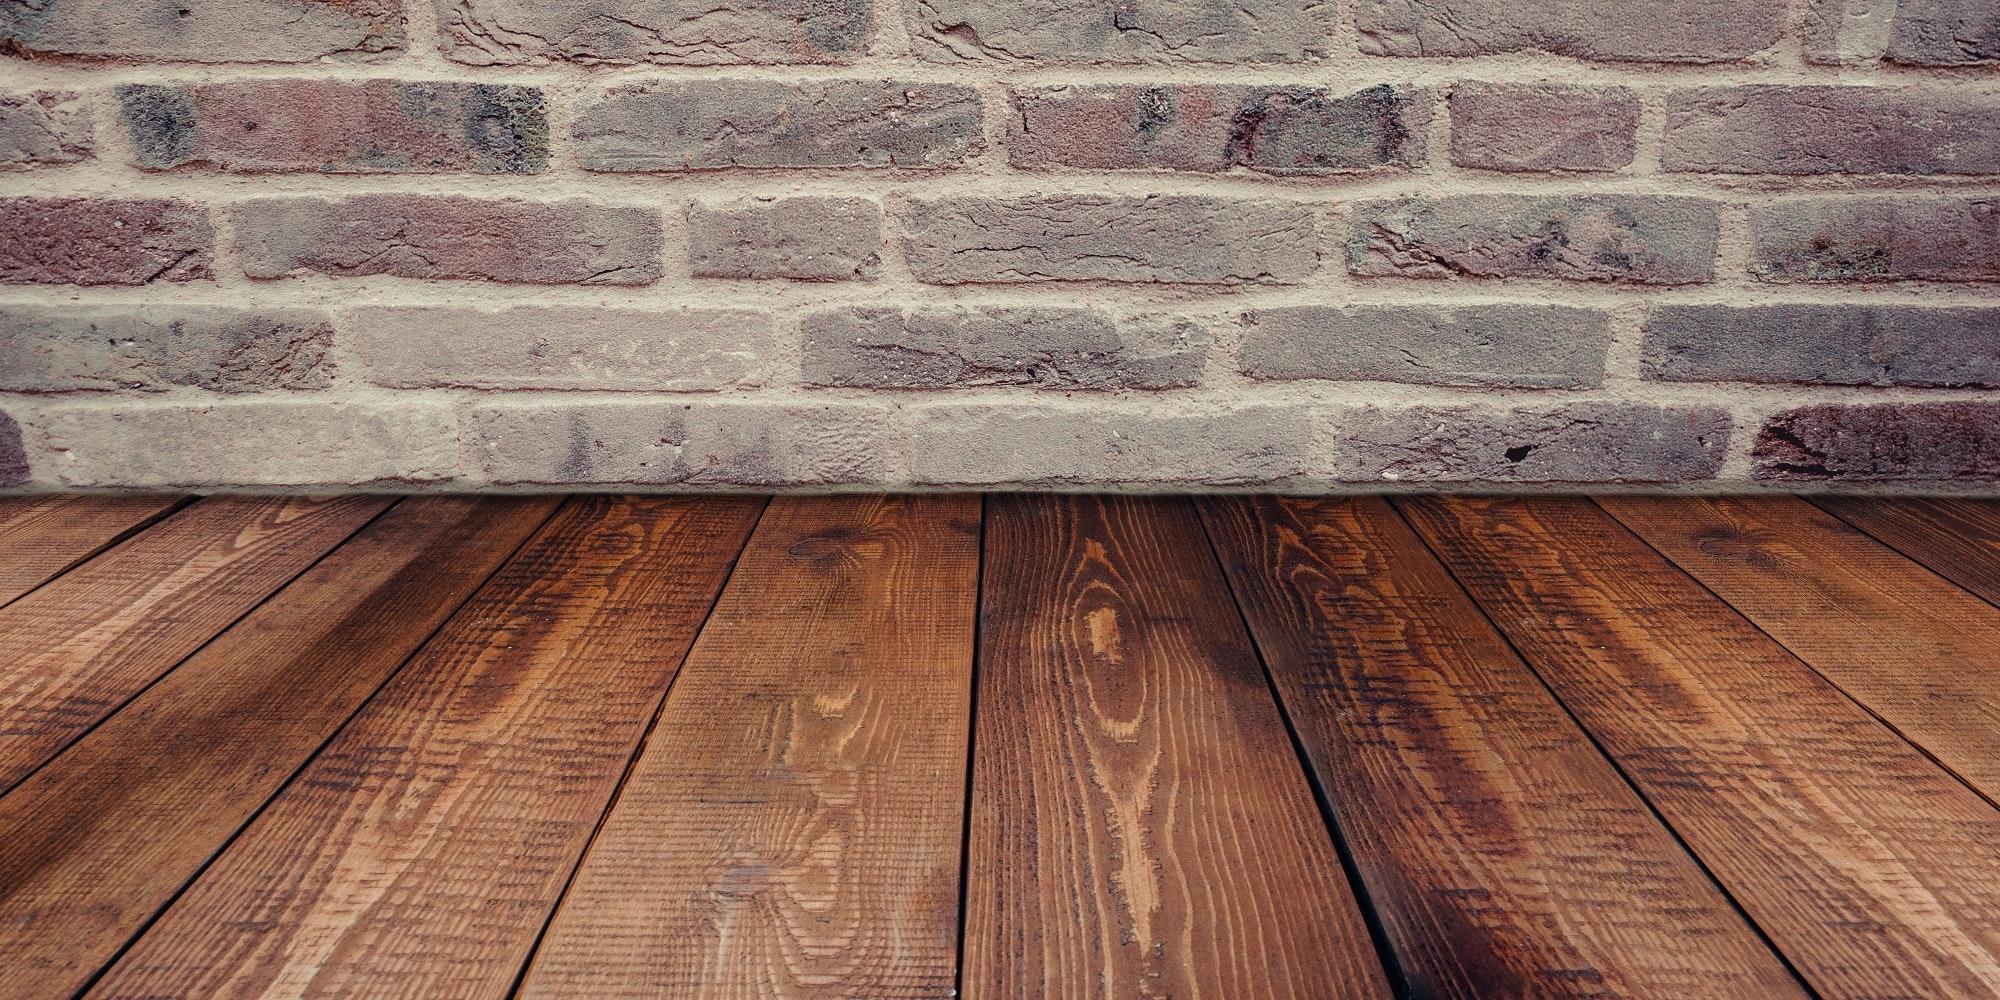 board-bricks-brickwork-269063.jpg